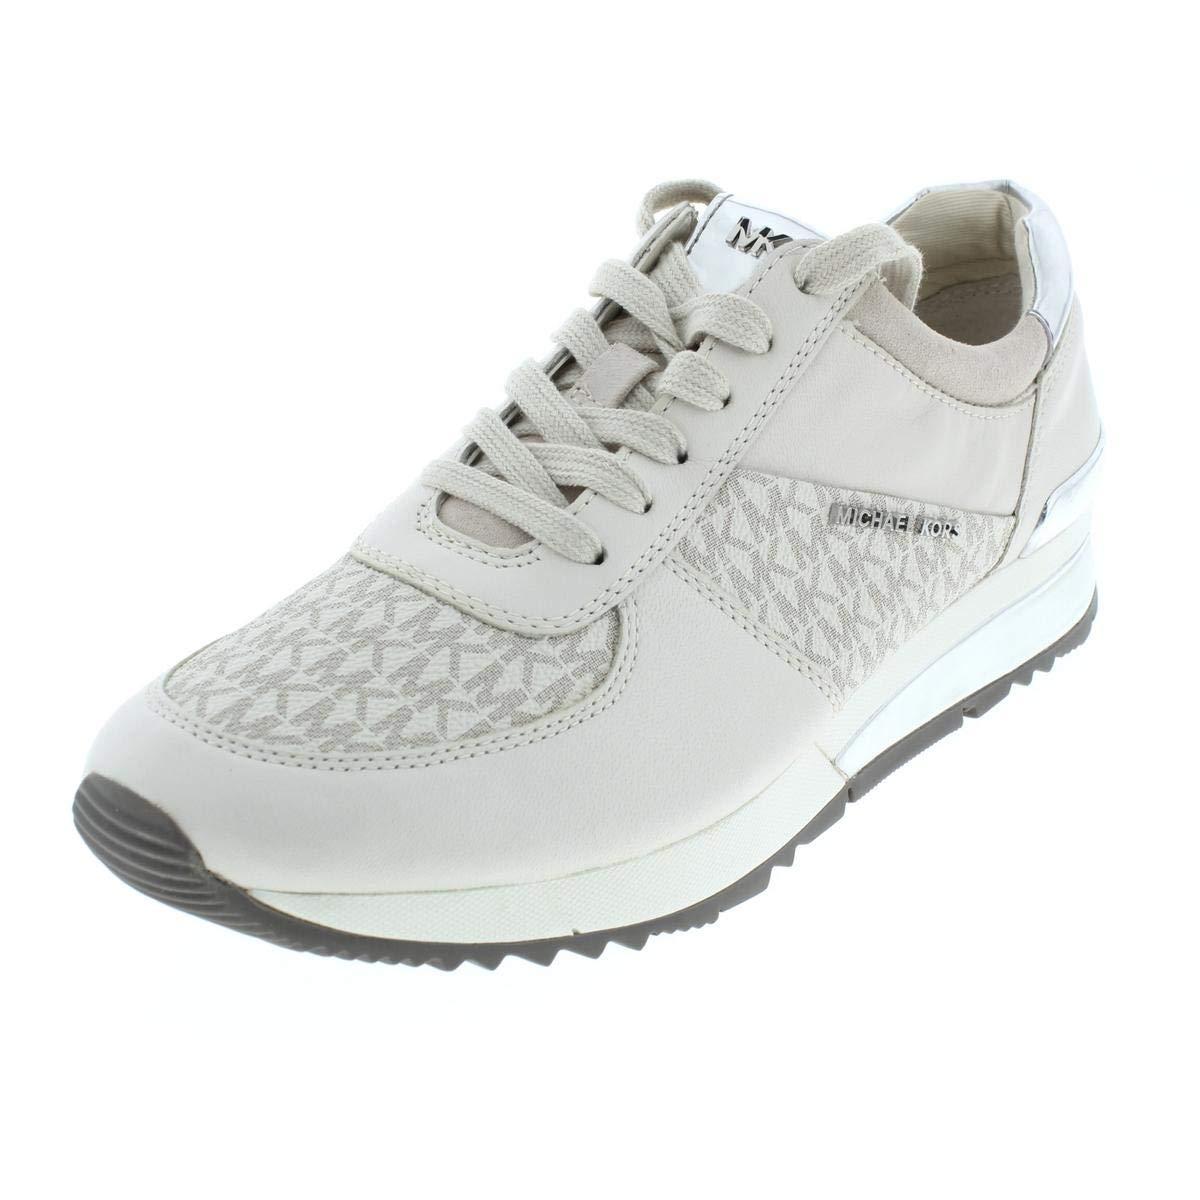 Michael Michael Kors Womens Allie Leather Sneakers Trainers Ivory 5 Medium (B,M)